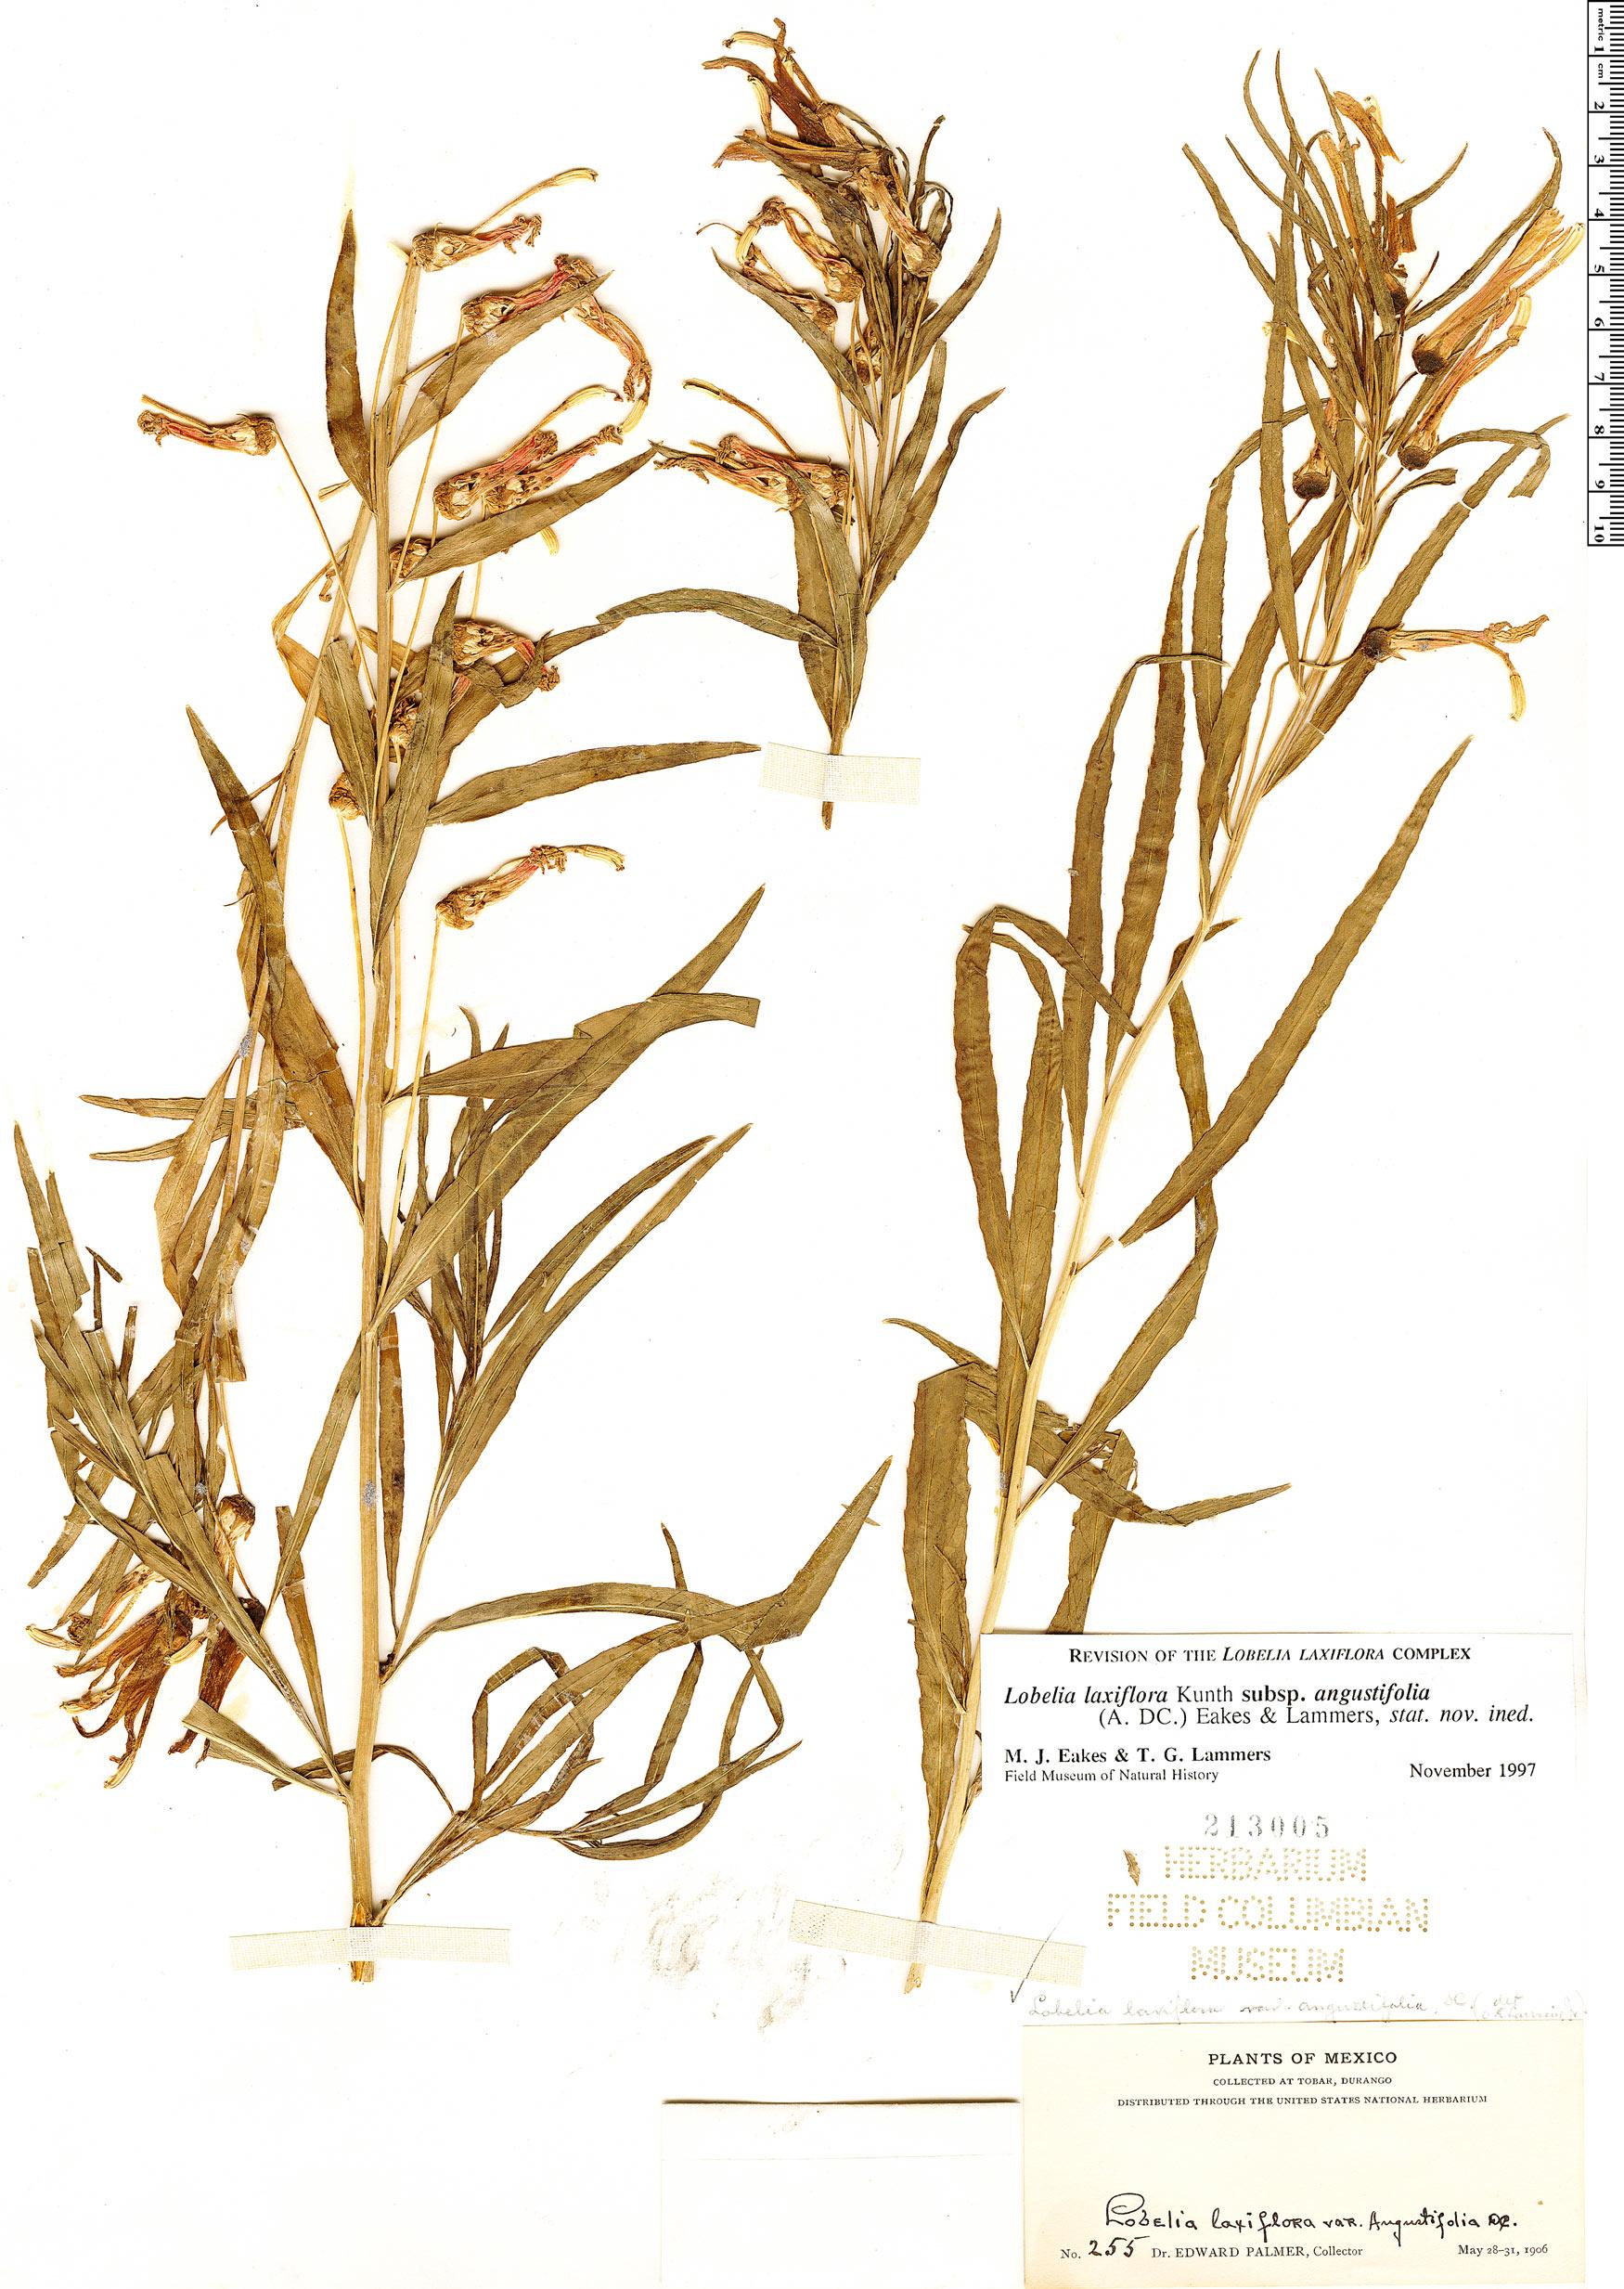 Specimen: Lobelia laxiflora